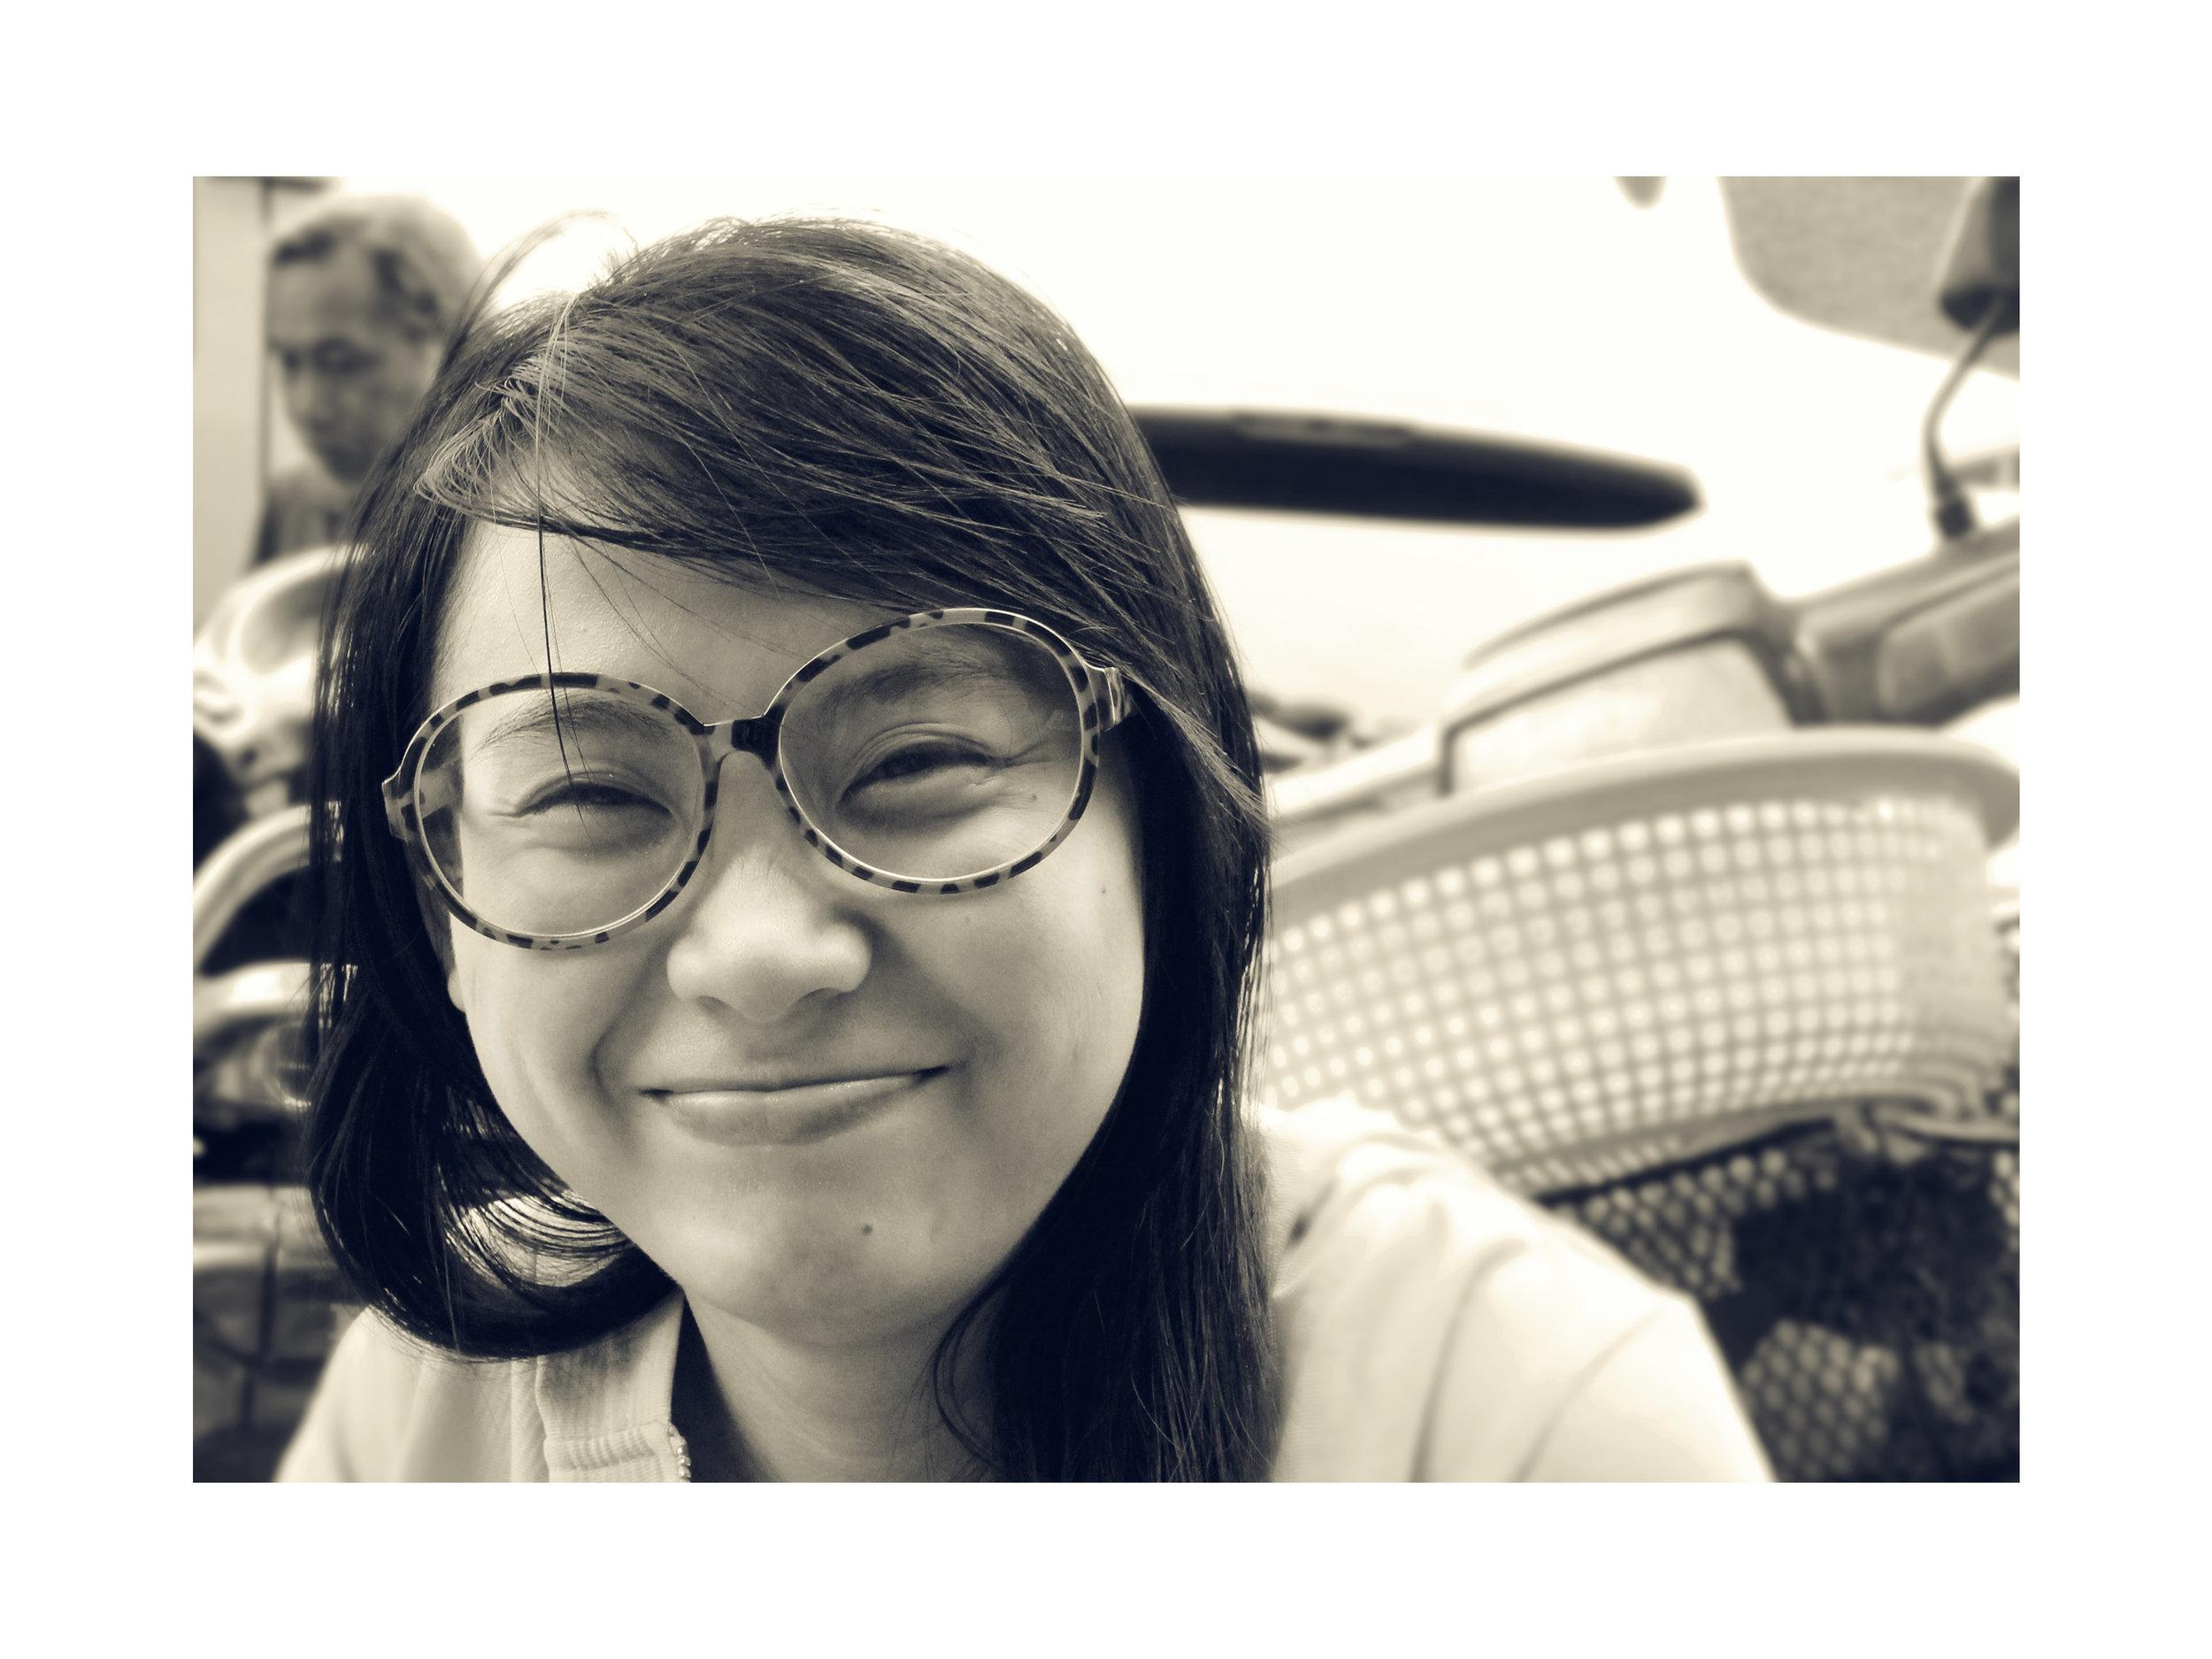 JW_face VI_029.jpg